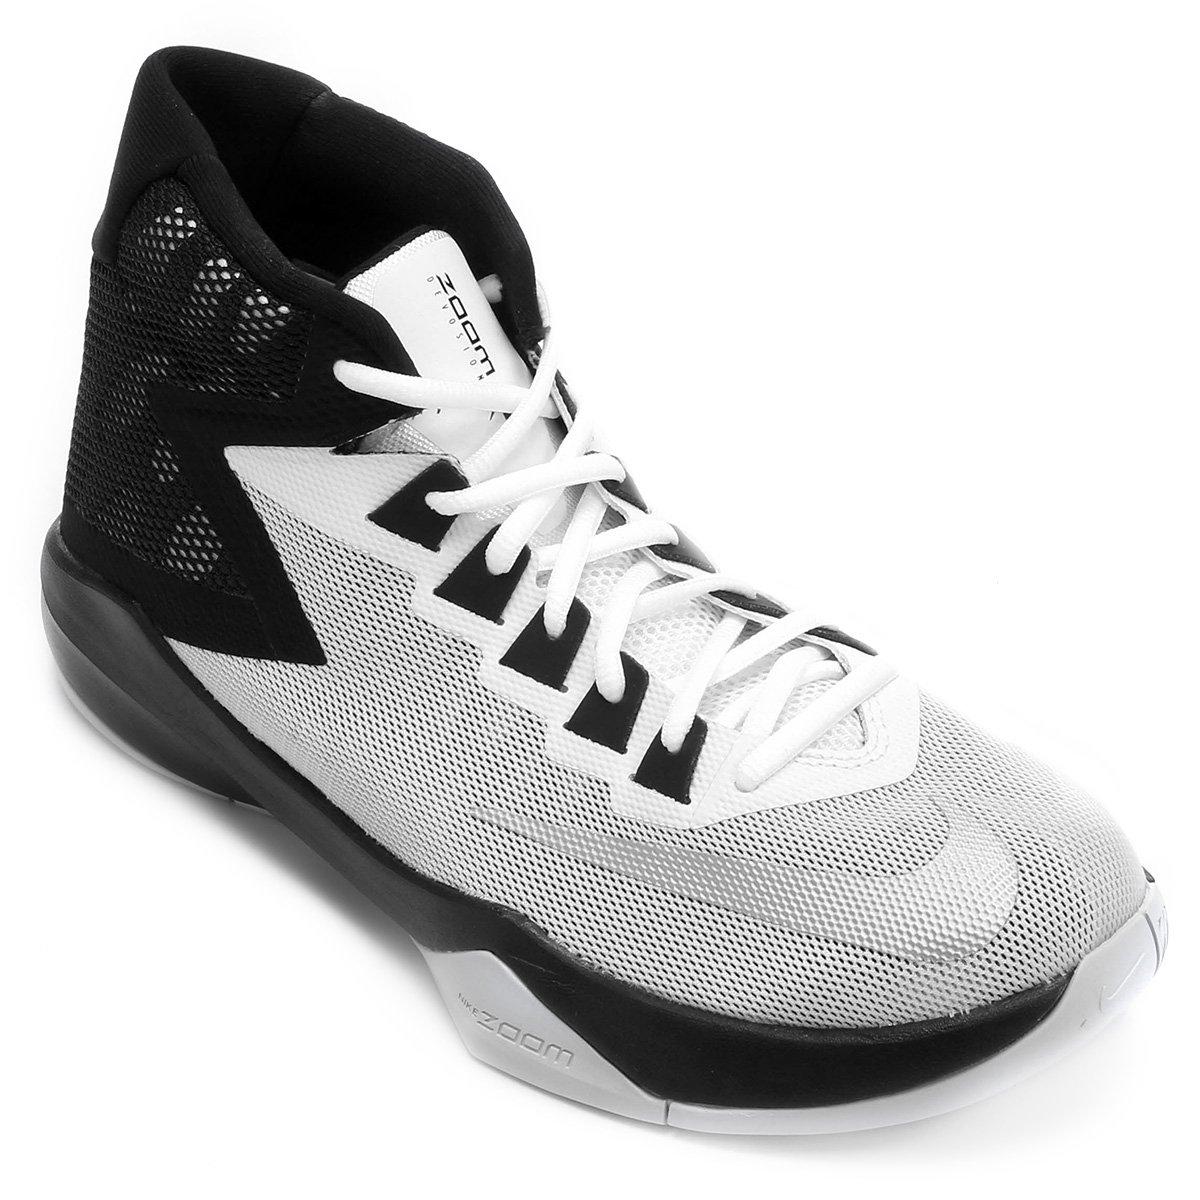 9286c866bb85a ... 70ede000c7a Tênis Nike Zoom Devosion - Branco e prata - Compre Agora  Netshoes ...